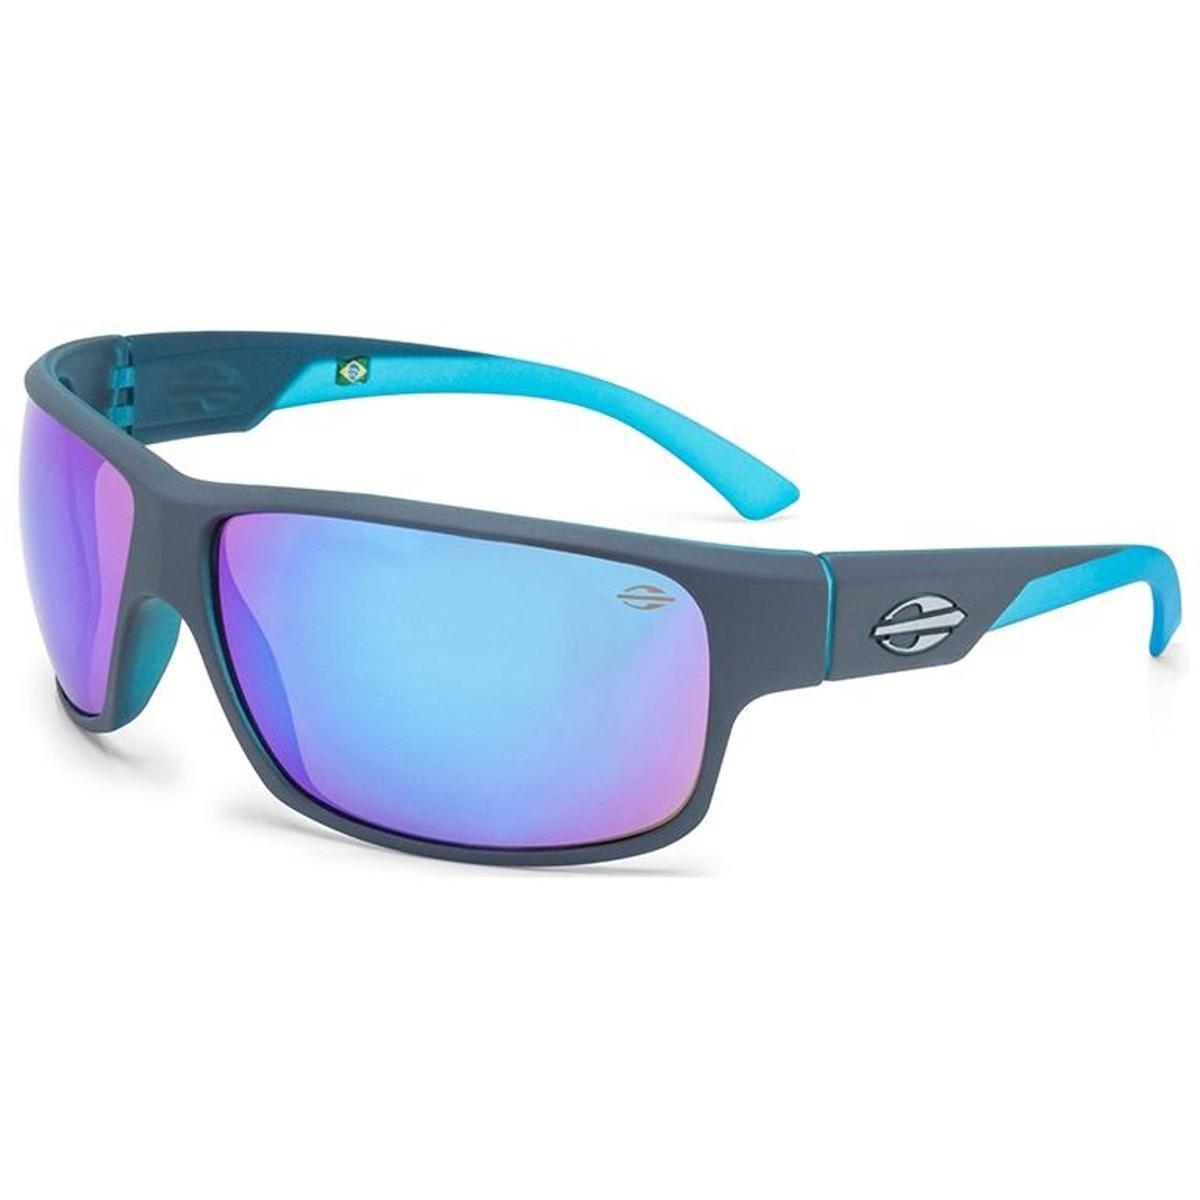 204690cc5 Óculos Sol Mormaii Joaca 2 445D6997 Cinza Com Azul | Netshoes